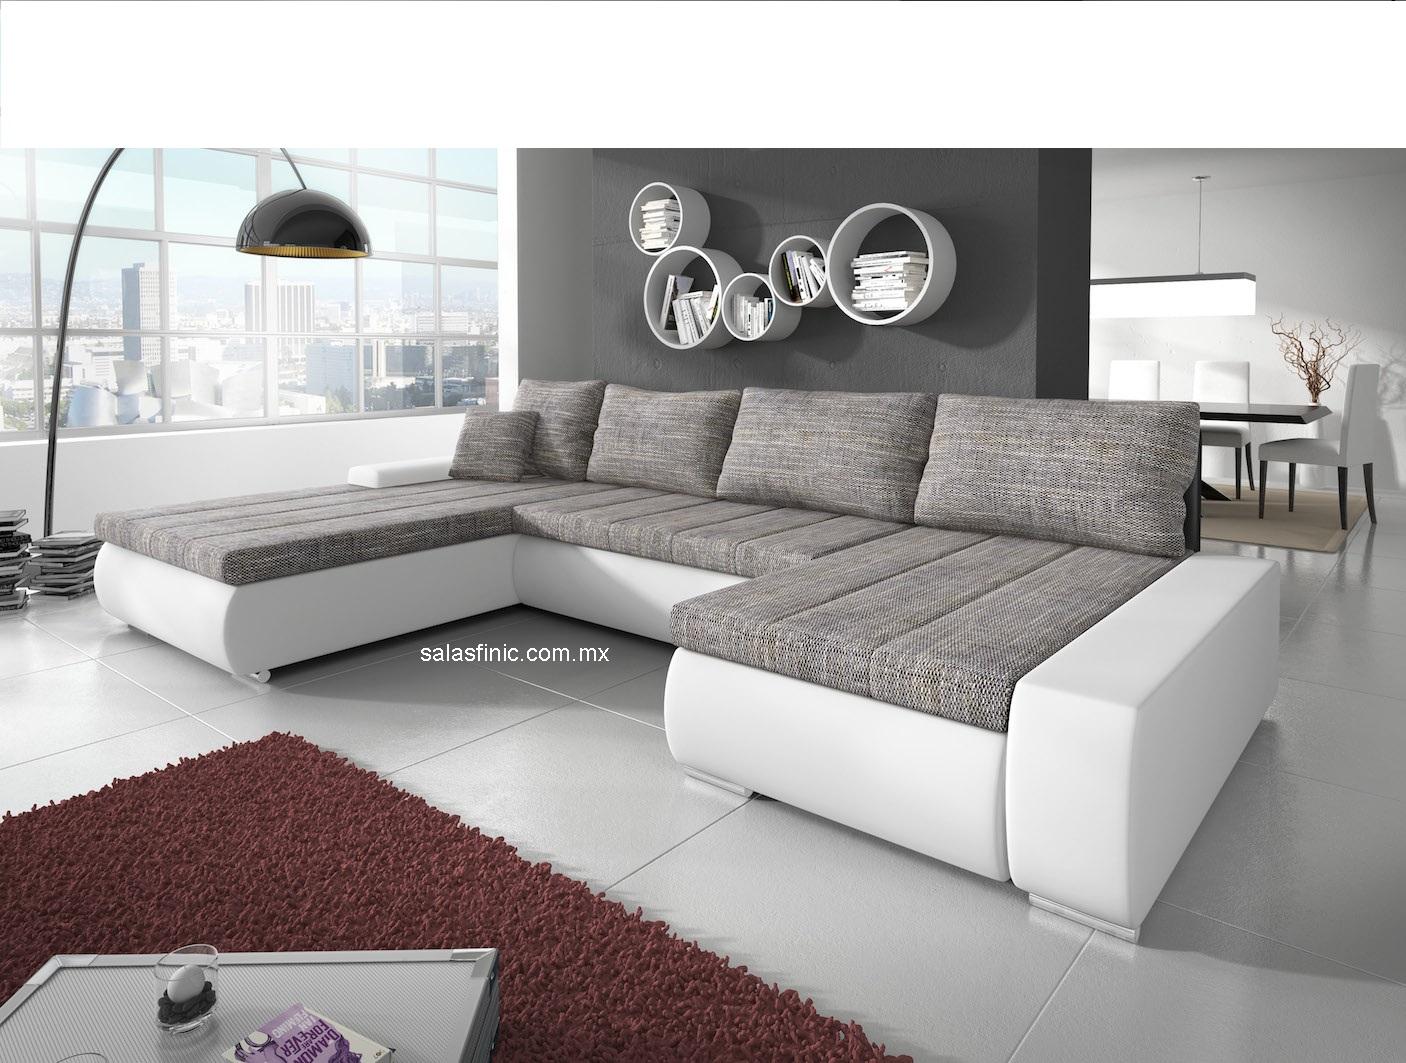 Muebles rusticos salas modernas furniture decoration for Fabricantes de muebles modernos